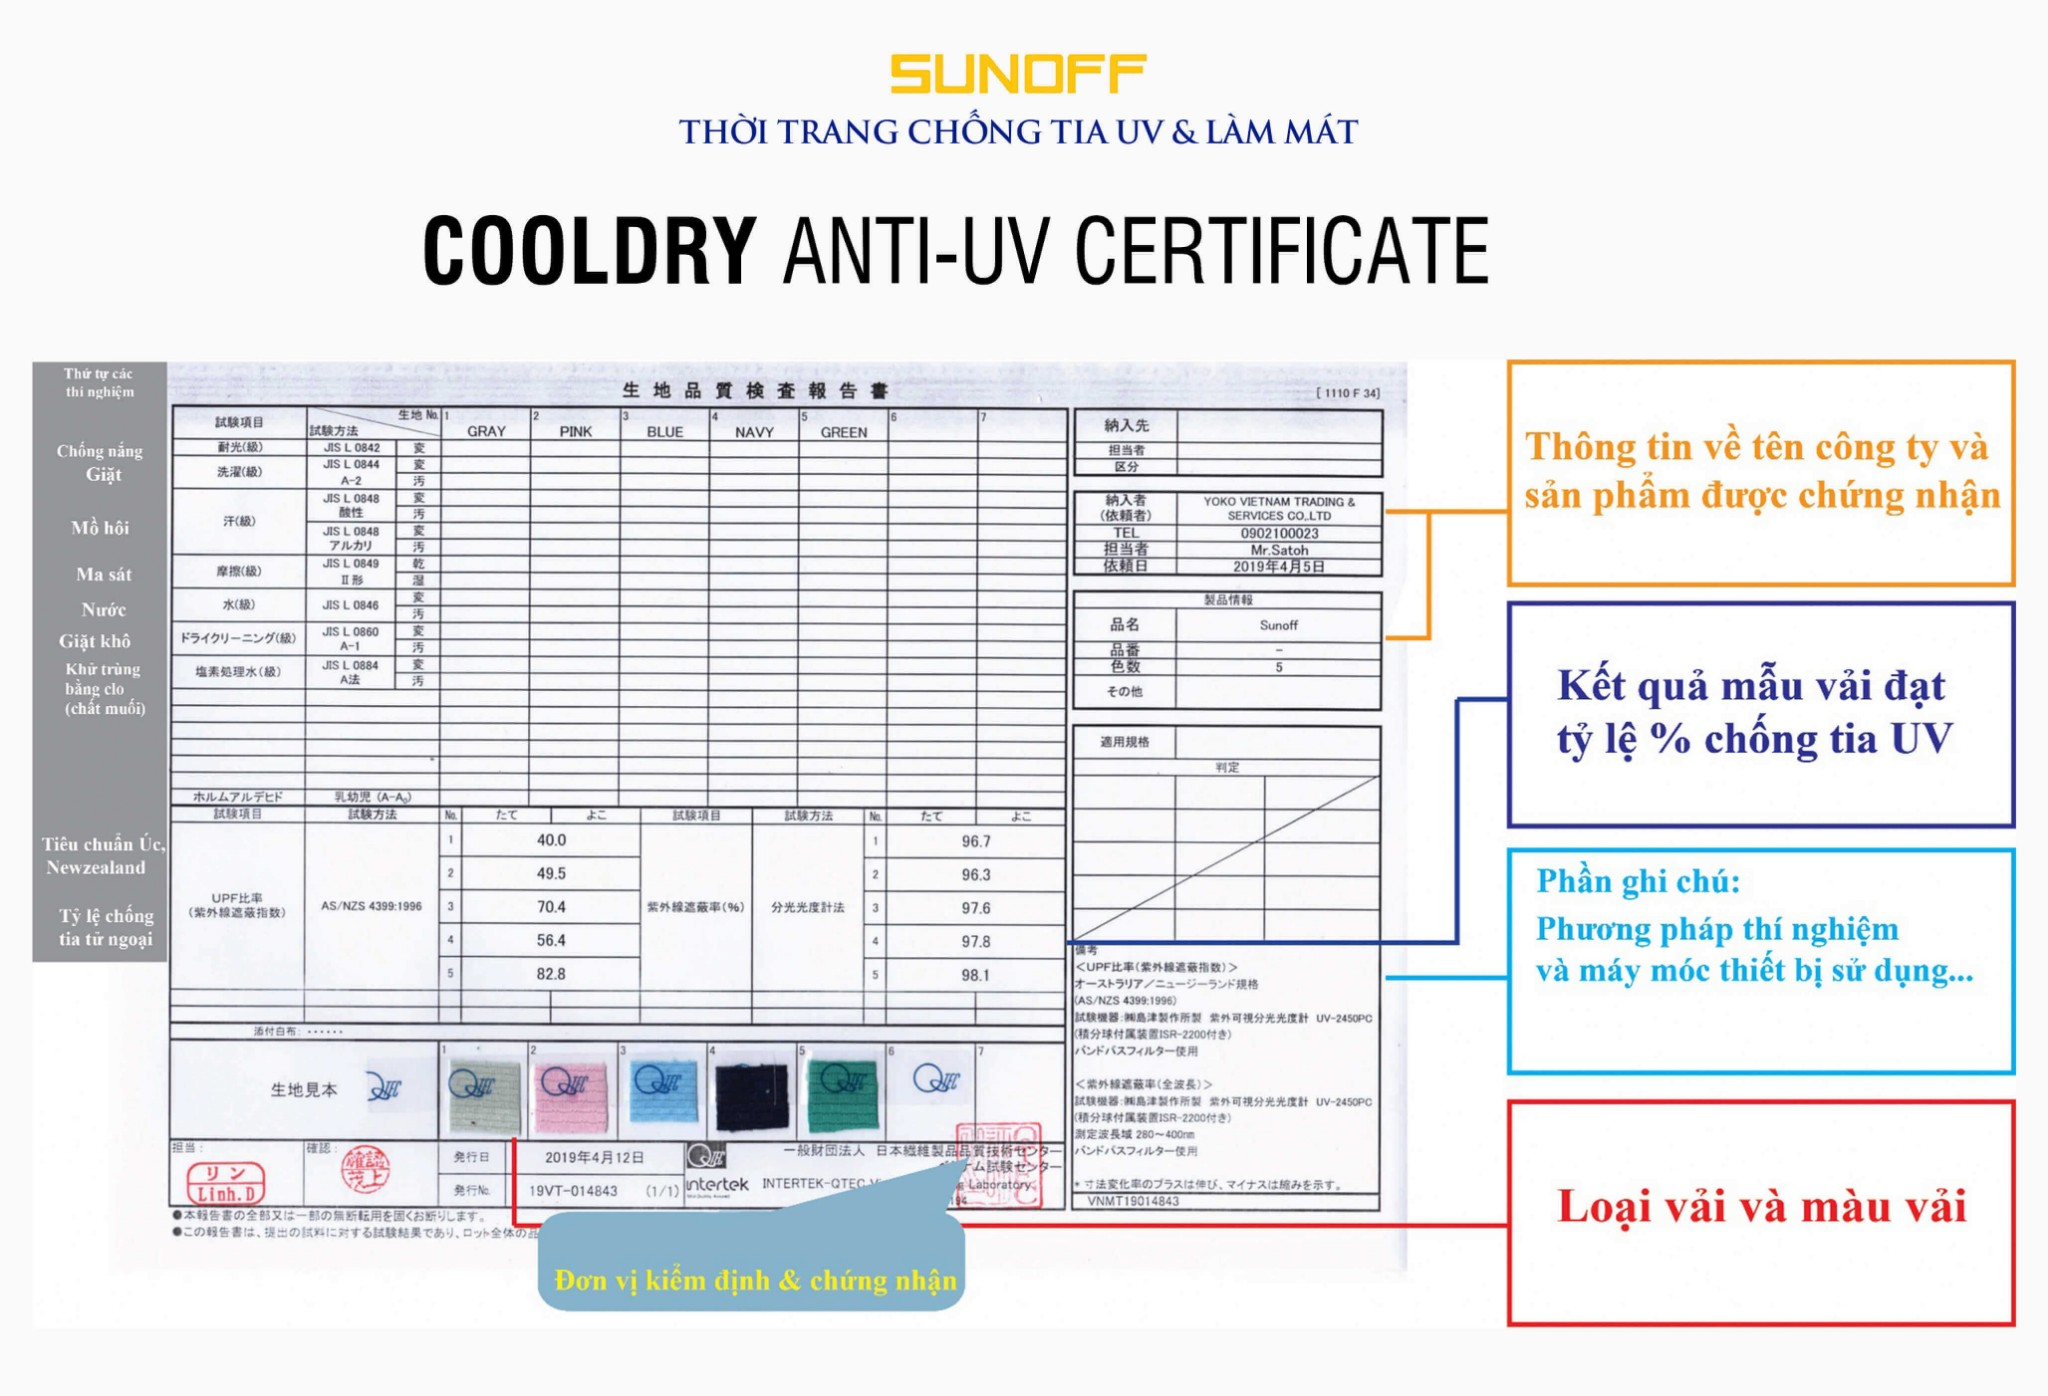 Giay-chung-nhan-sunoff-cooldry-intertek-nhat-ban-chong-tia-uv